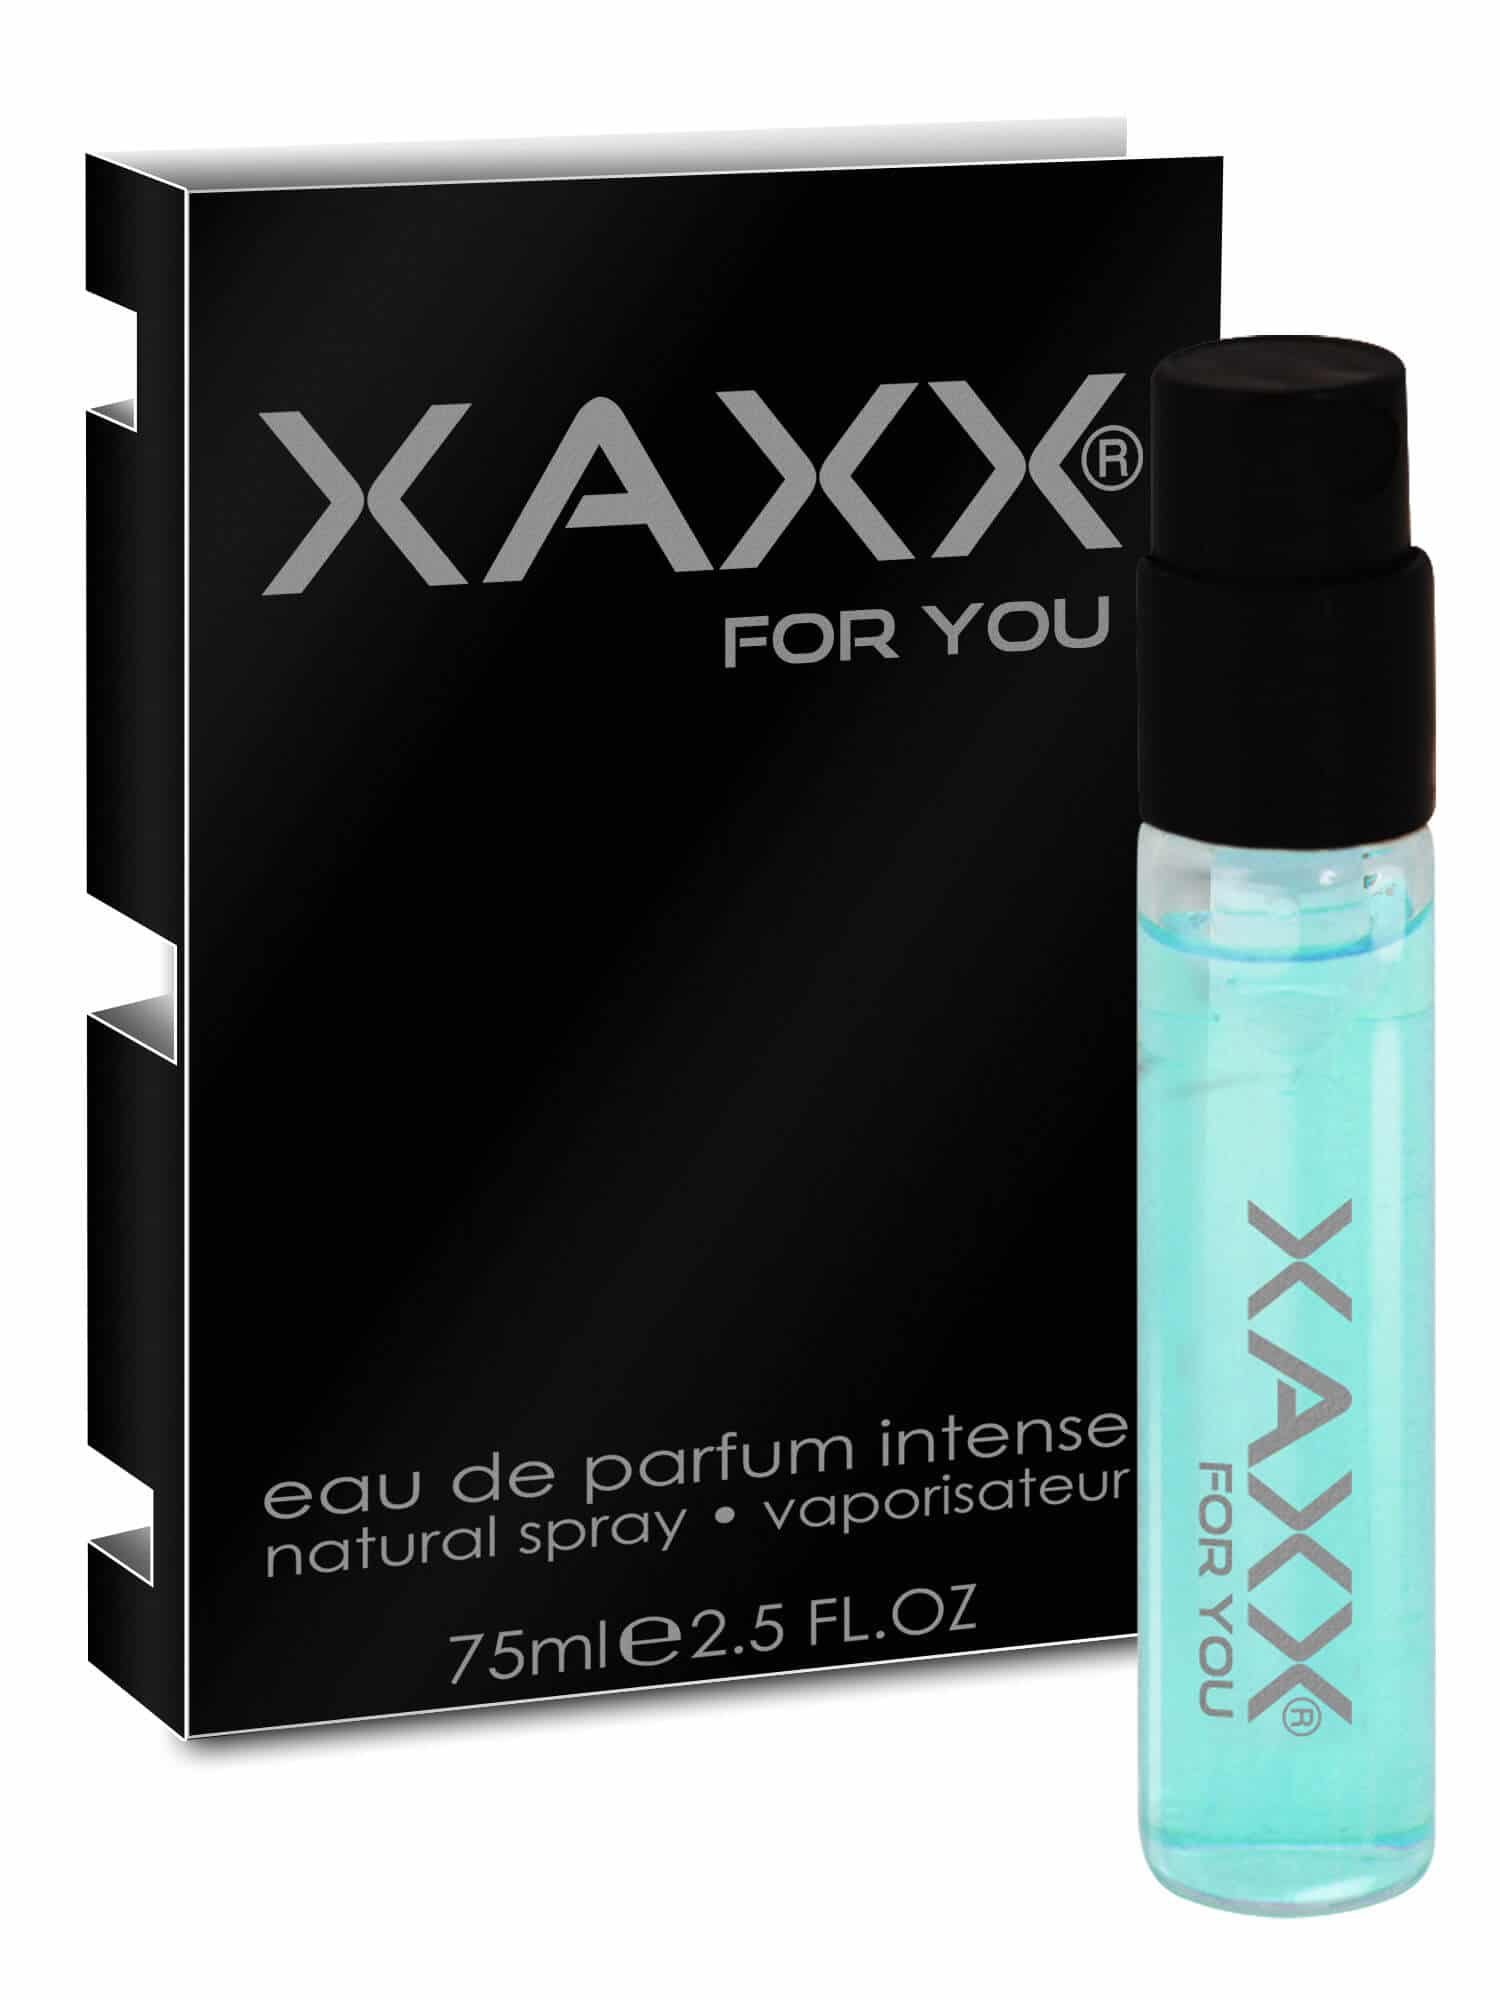 XAXX Herrenduft ONE intense Probe